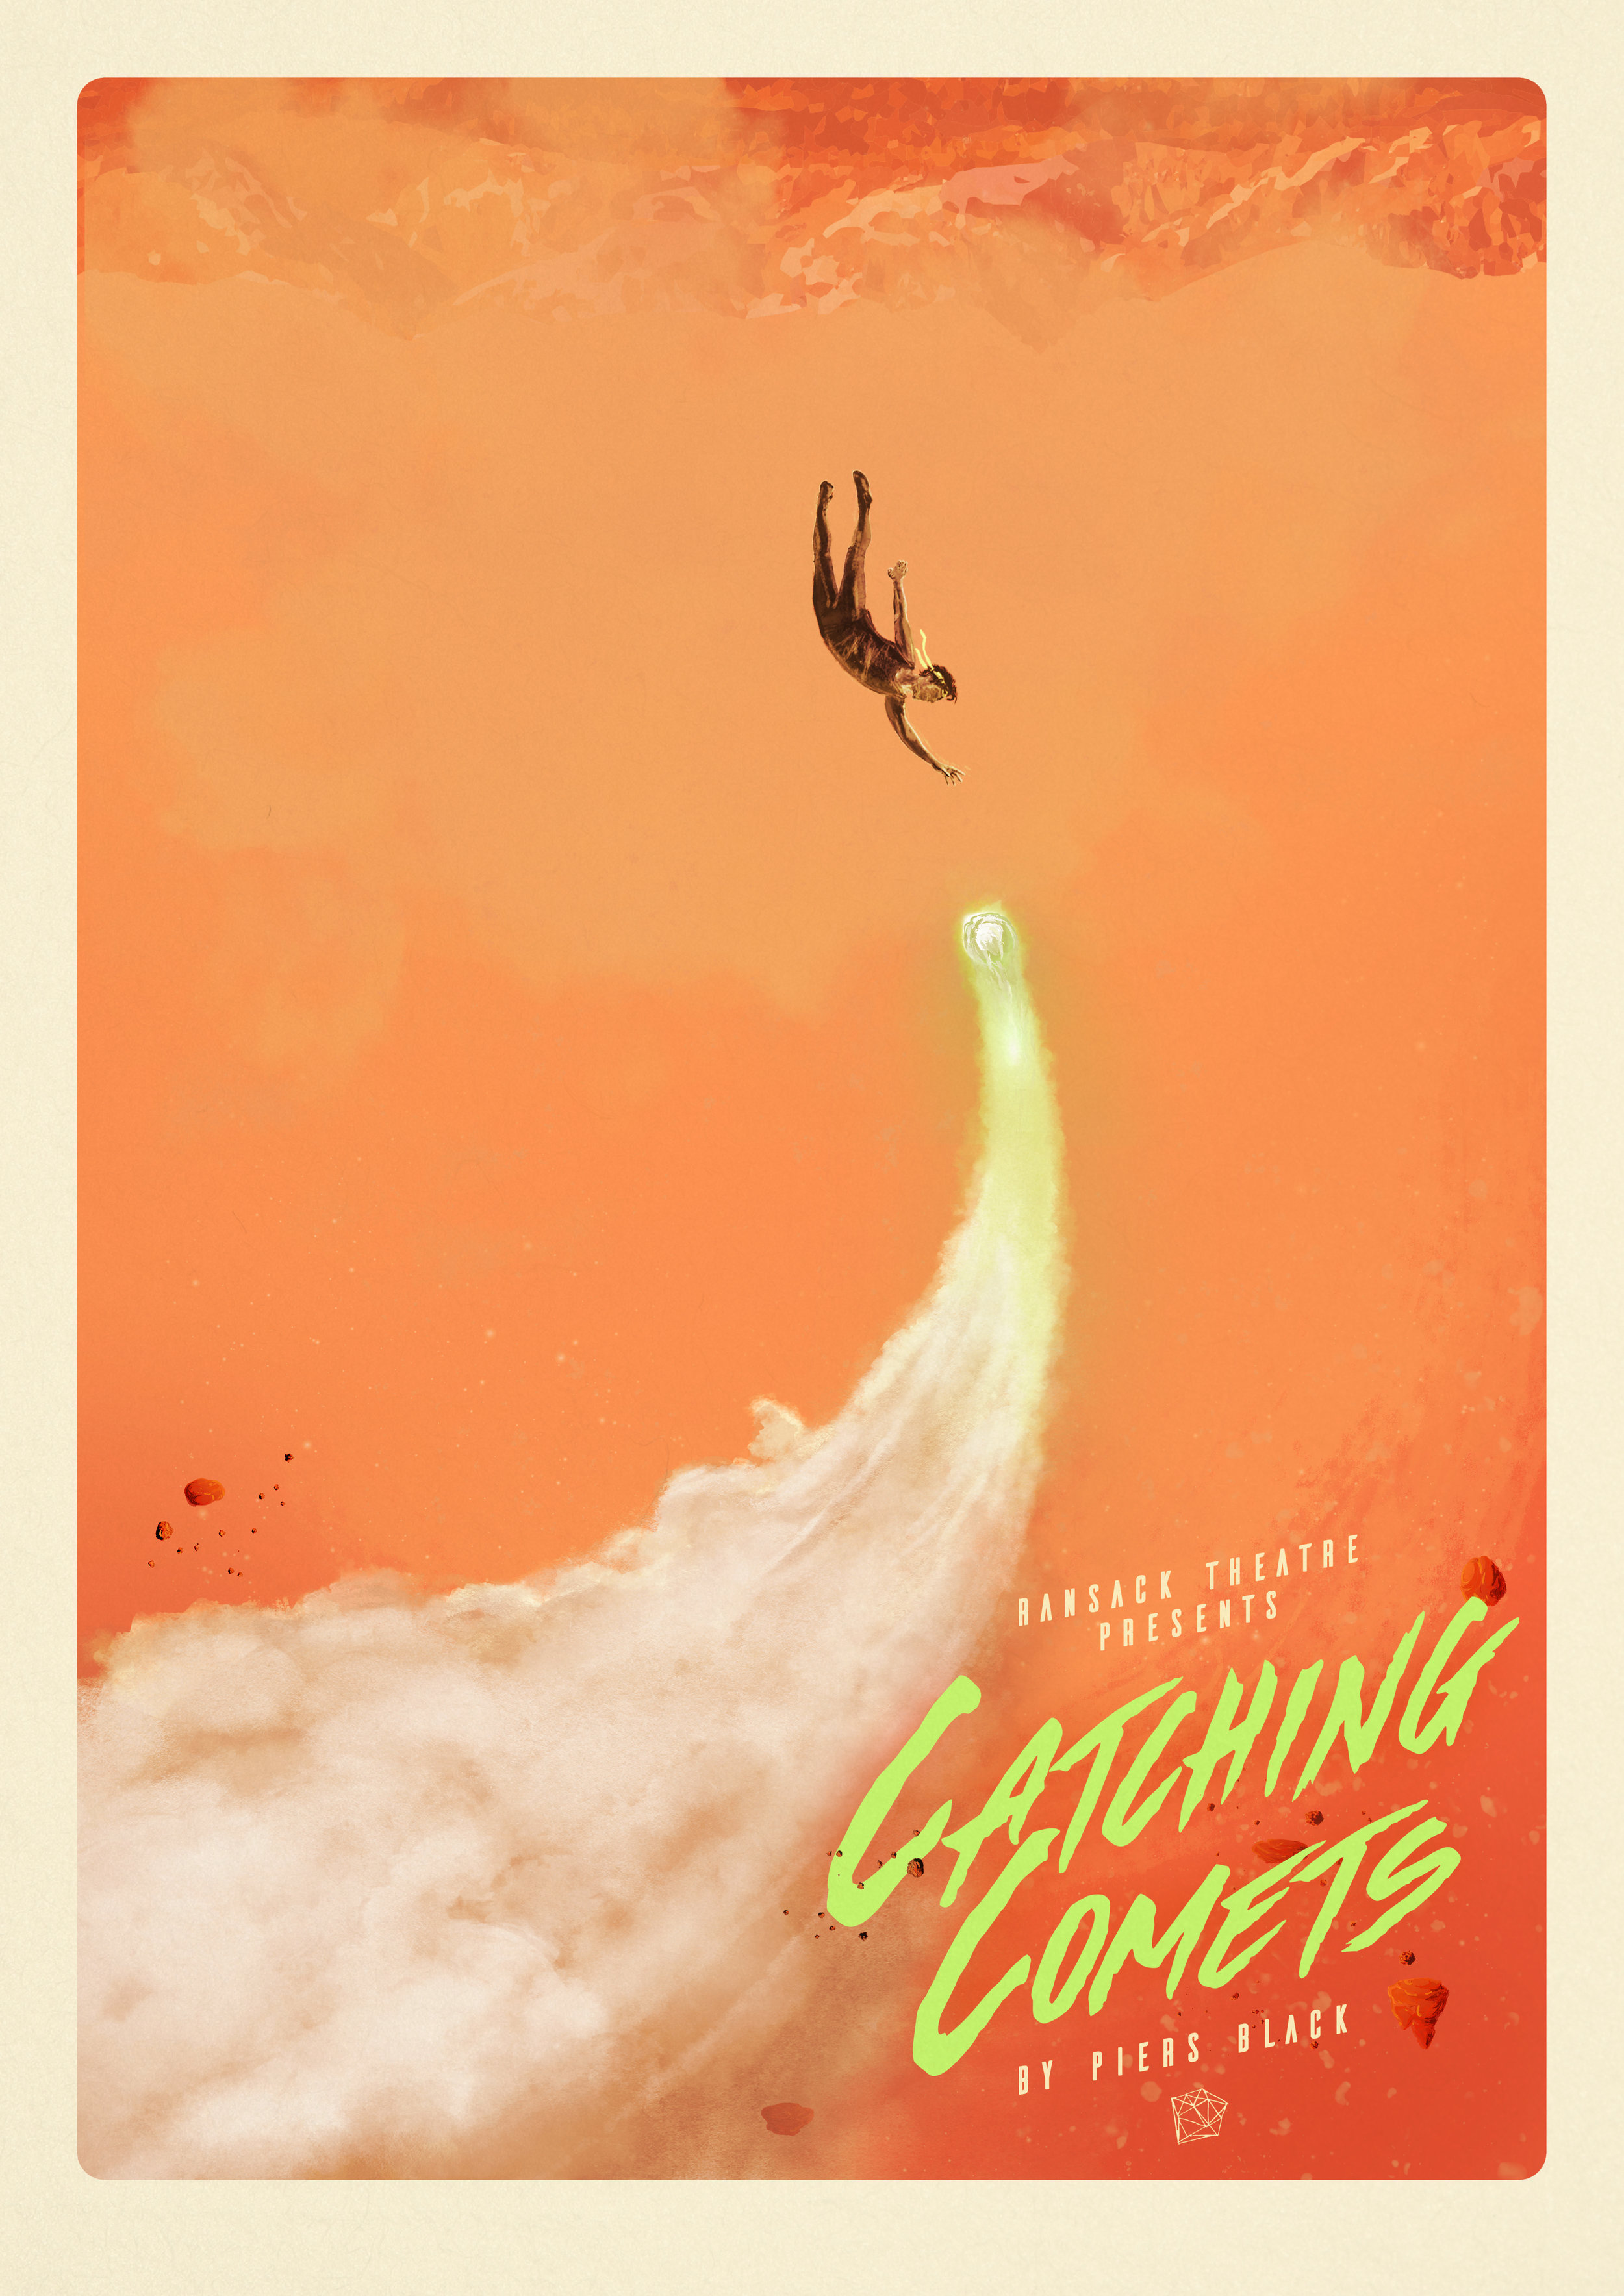 Catching Comets.jpg